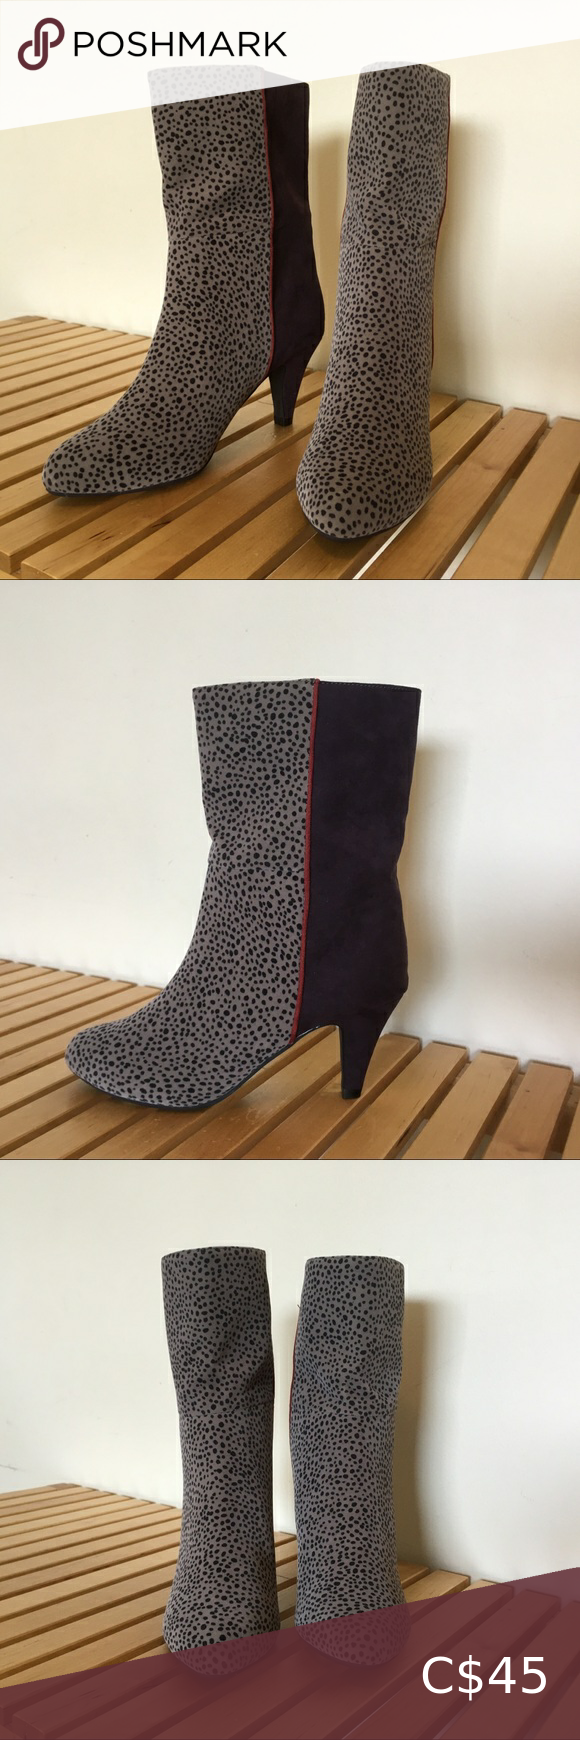 COCUE Short Boots